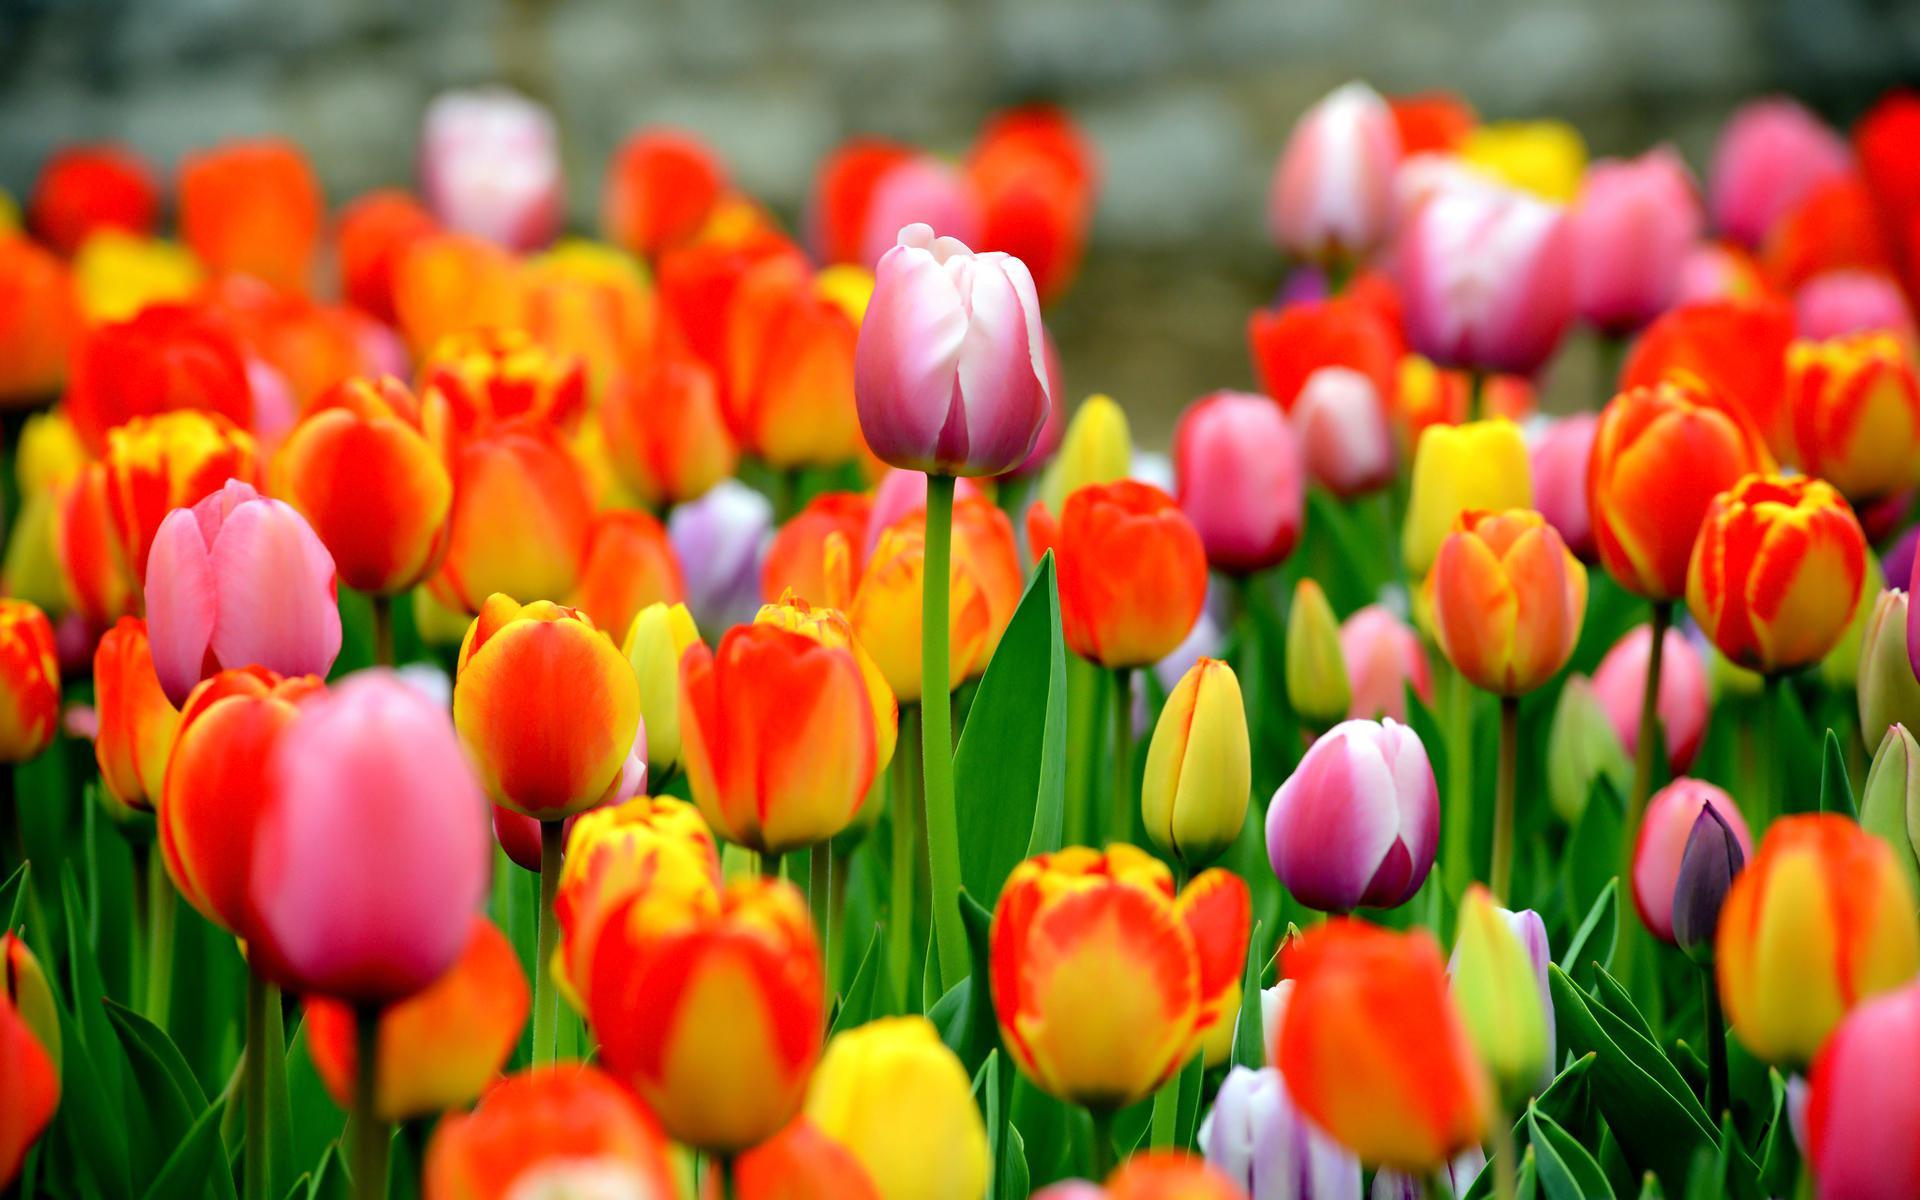 Field of tulips HQ WALLPAPER - (#154593)